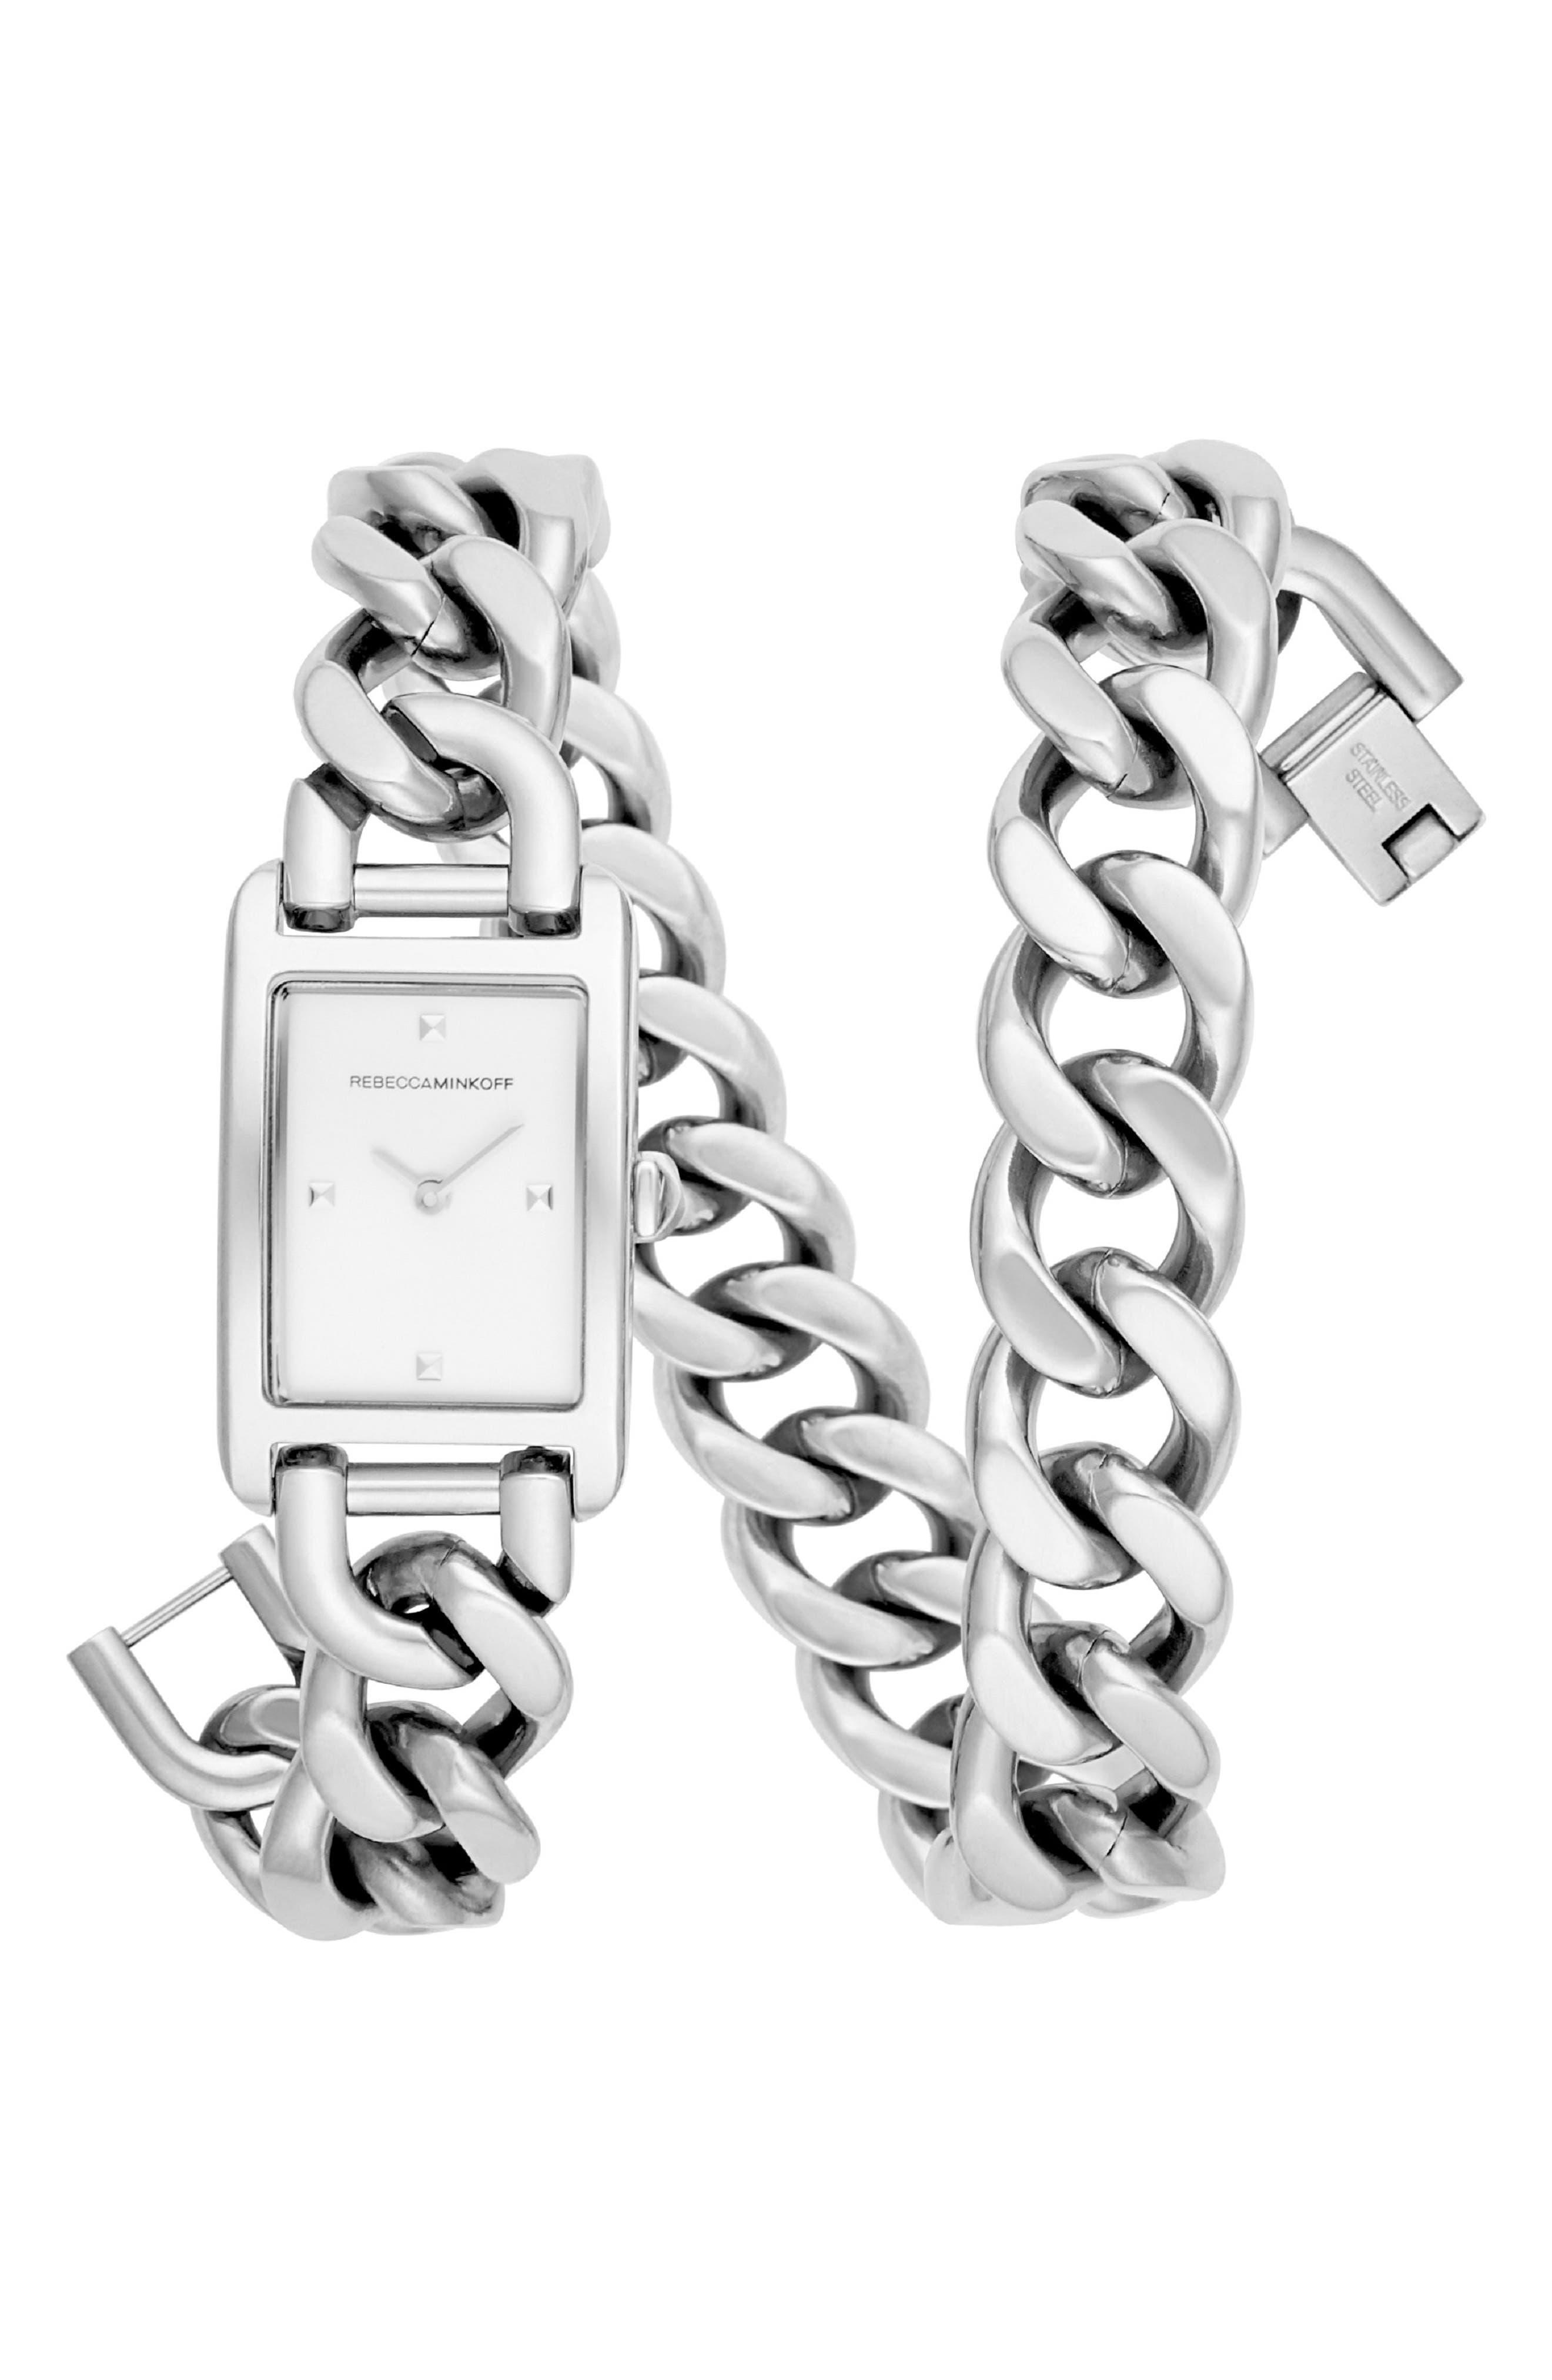 REBECCA MINKOFF Moment Chain Wrap Bracelet Watch, 19mm x 30mm, Main, color, SILVER